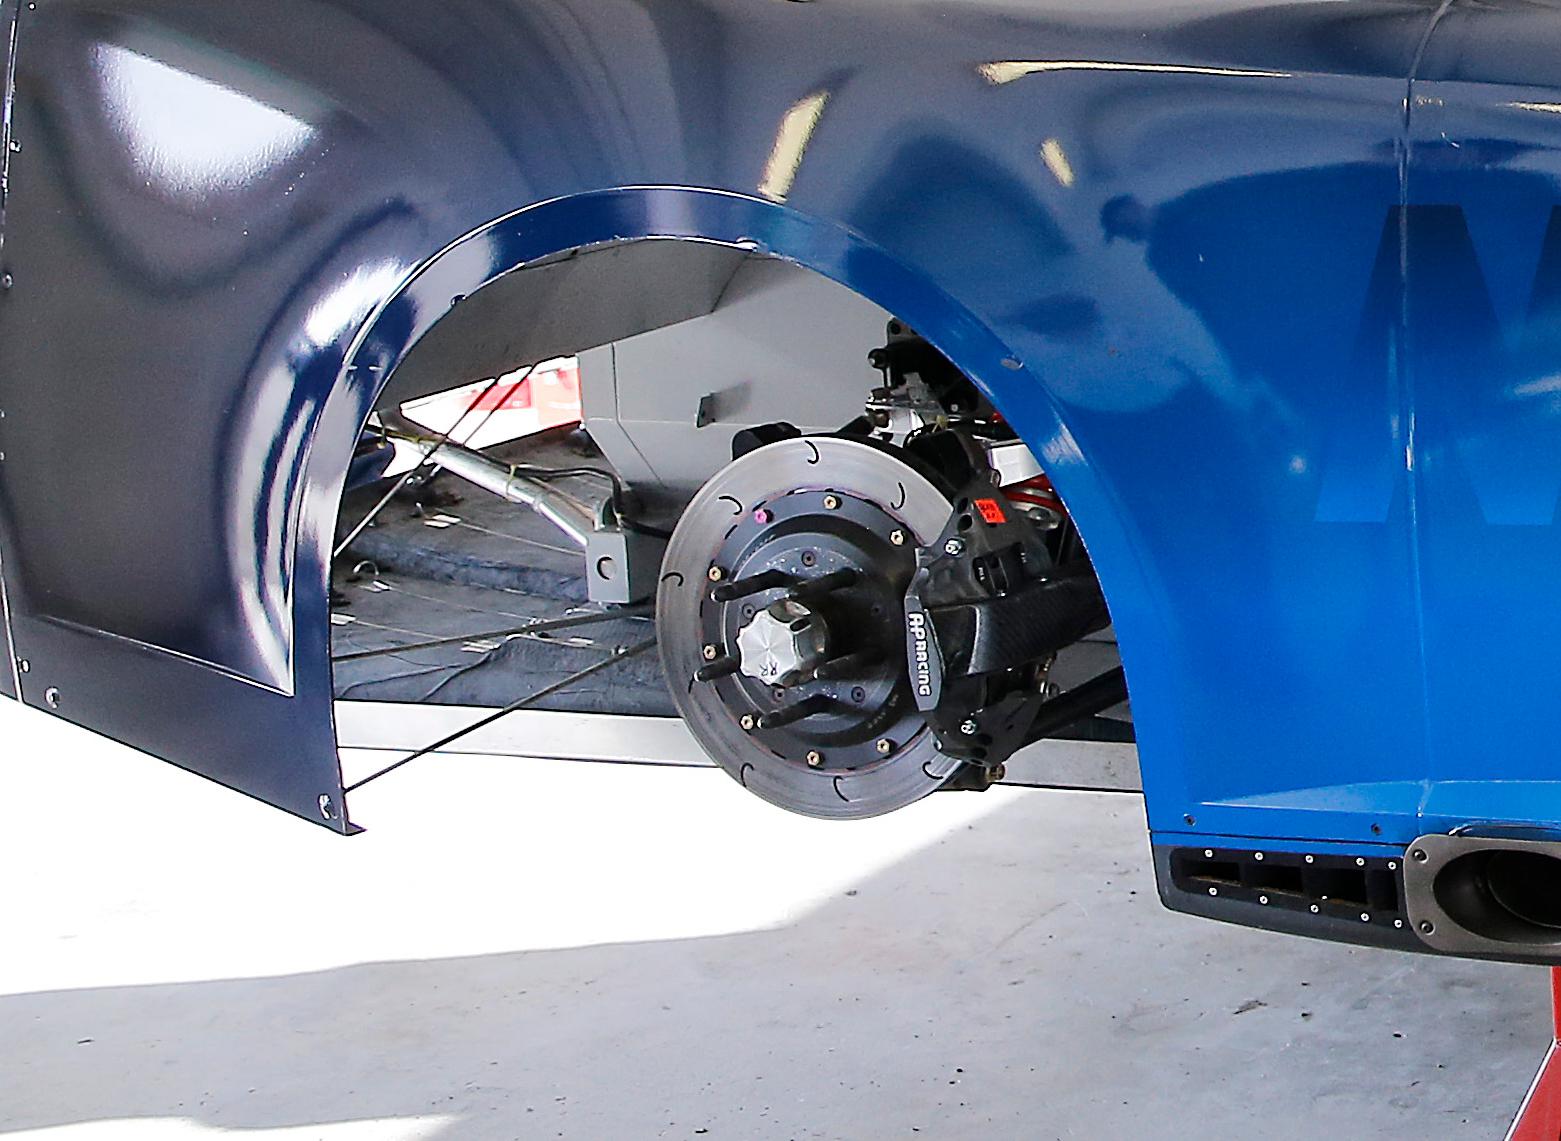 rear brake and caliper close-up